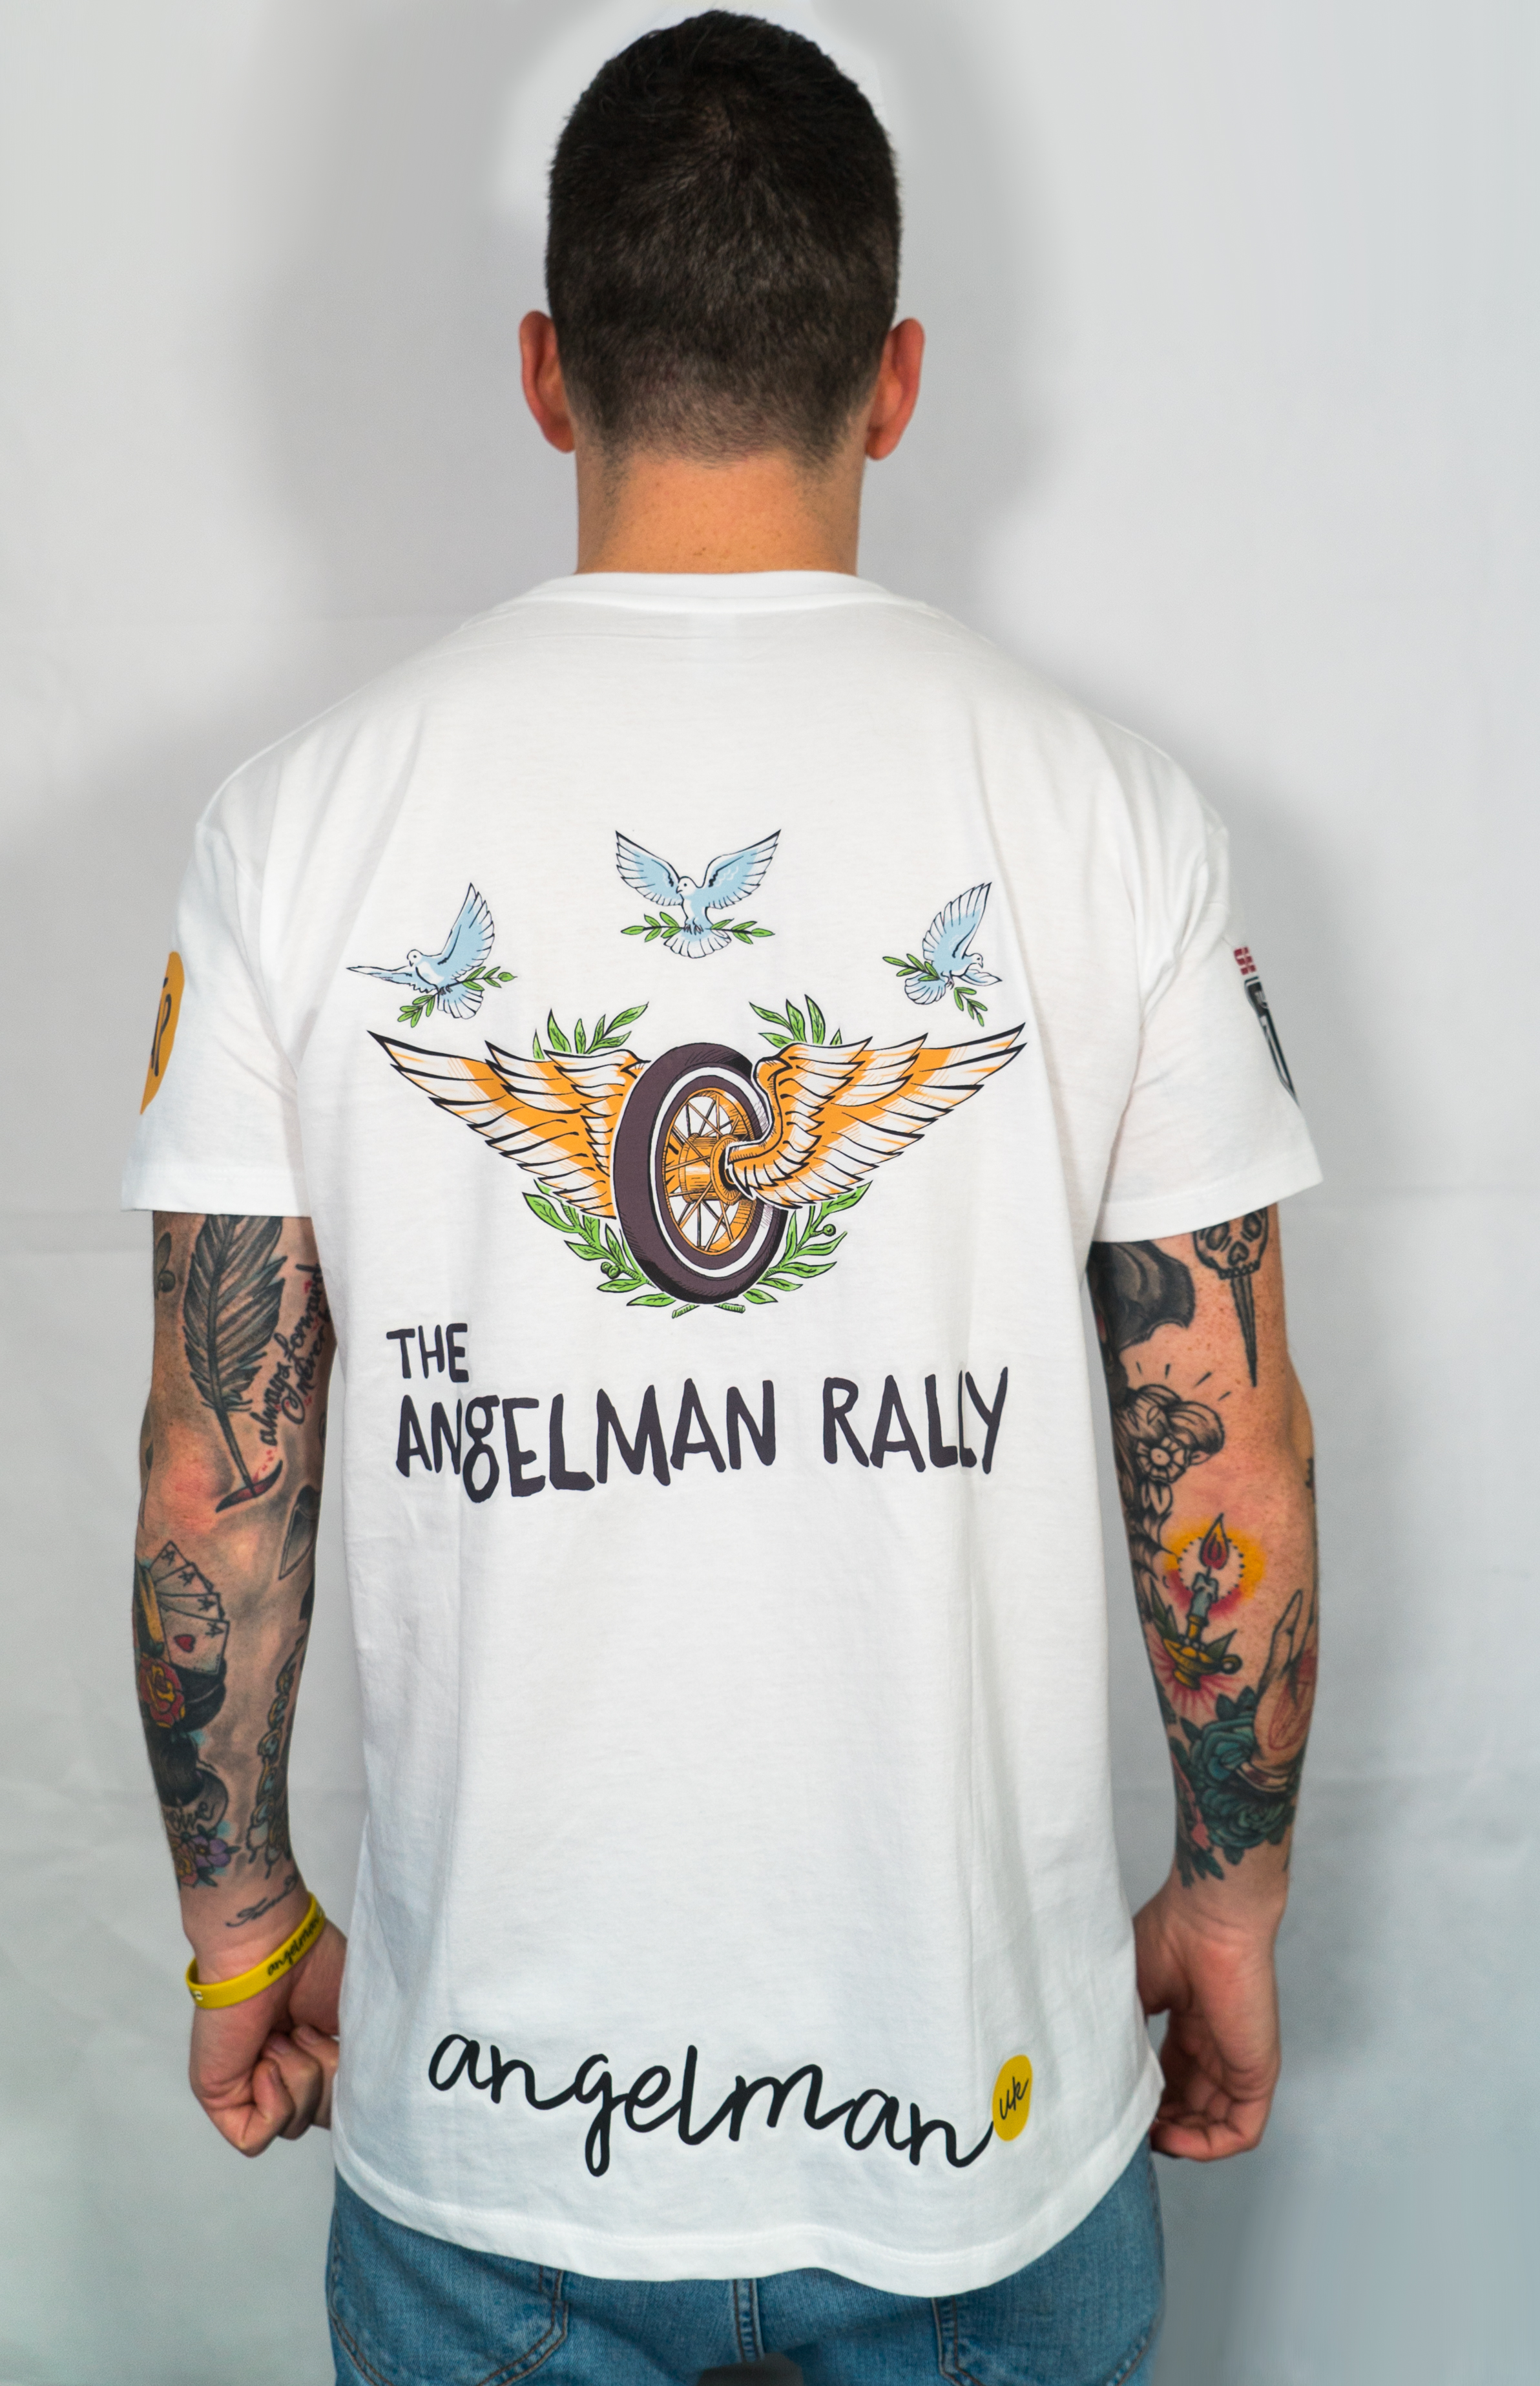 Angelman Rally